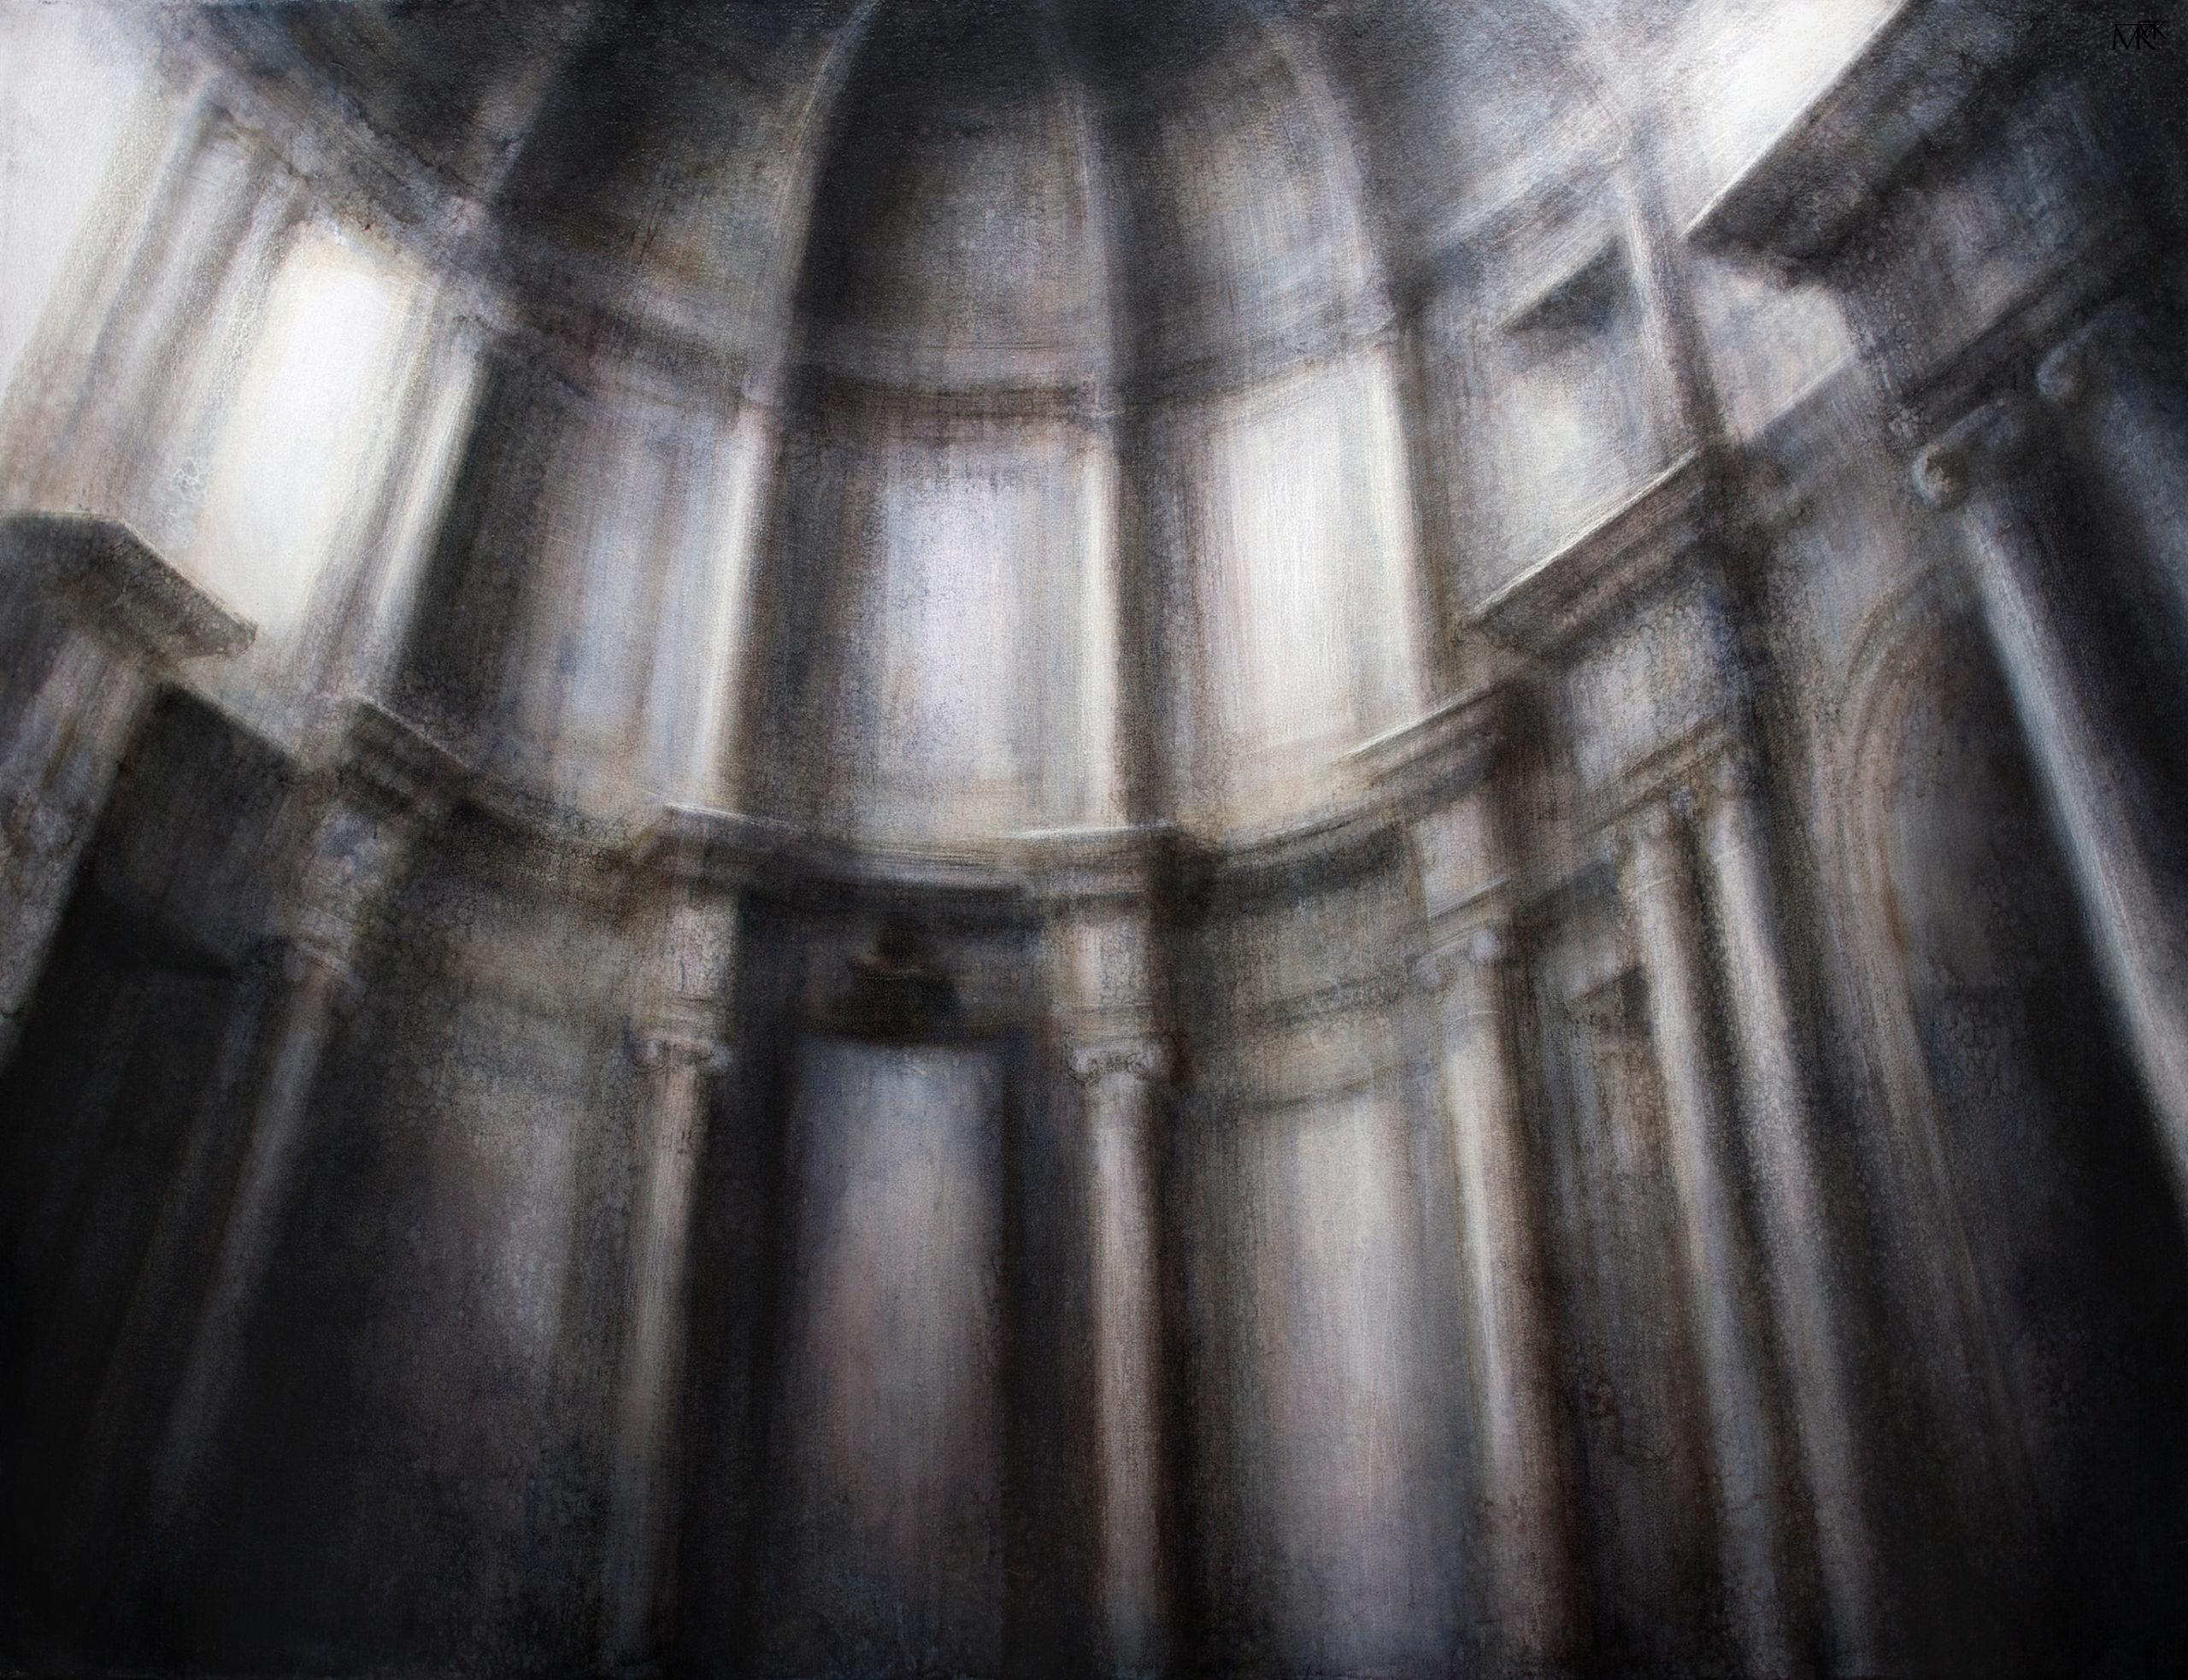 "Maya Kulenovic: APSE, 2015-16, oil on canvas, 73"" x 55"" (185cm x 140cm). 'Build' Series (Architecture, Interior)"